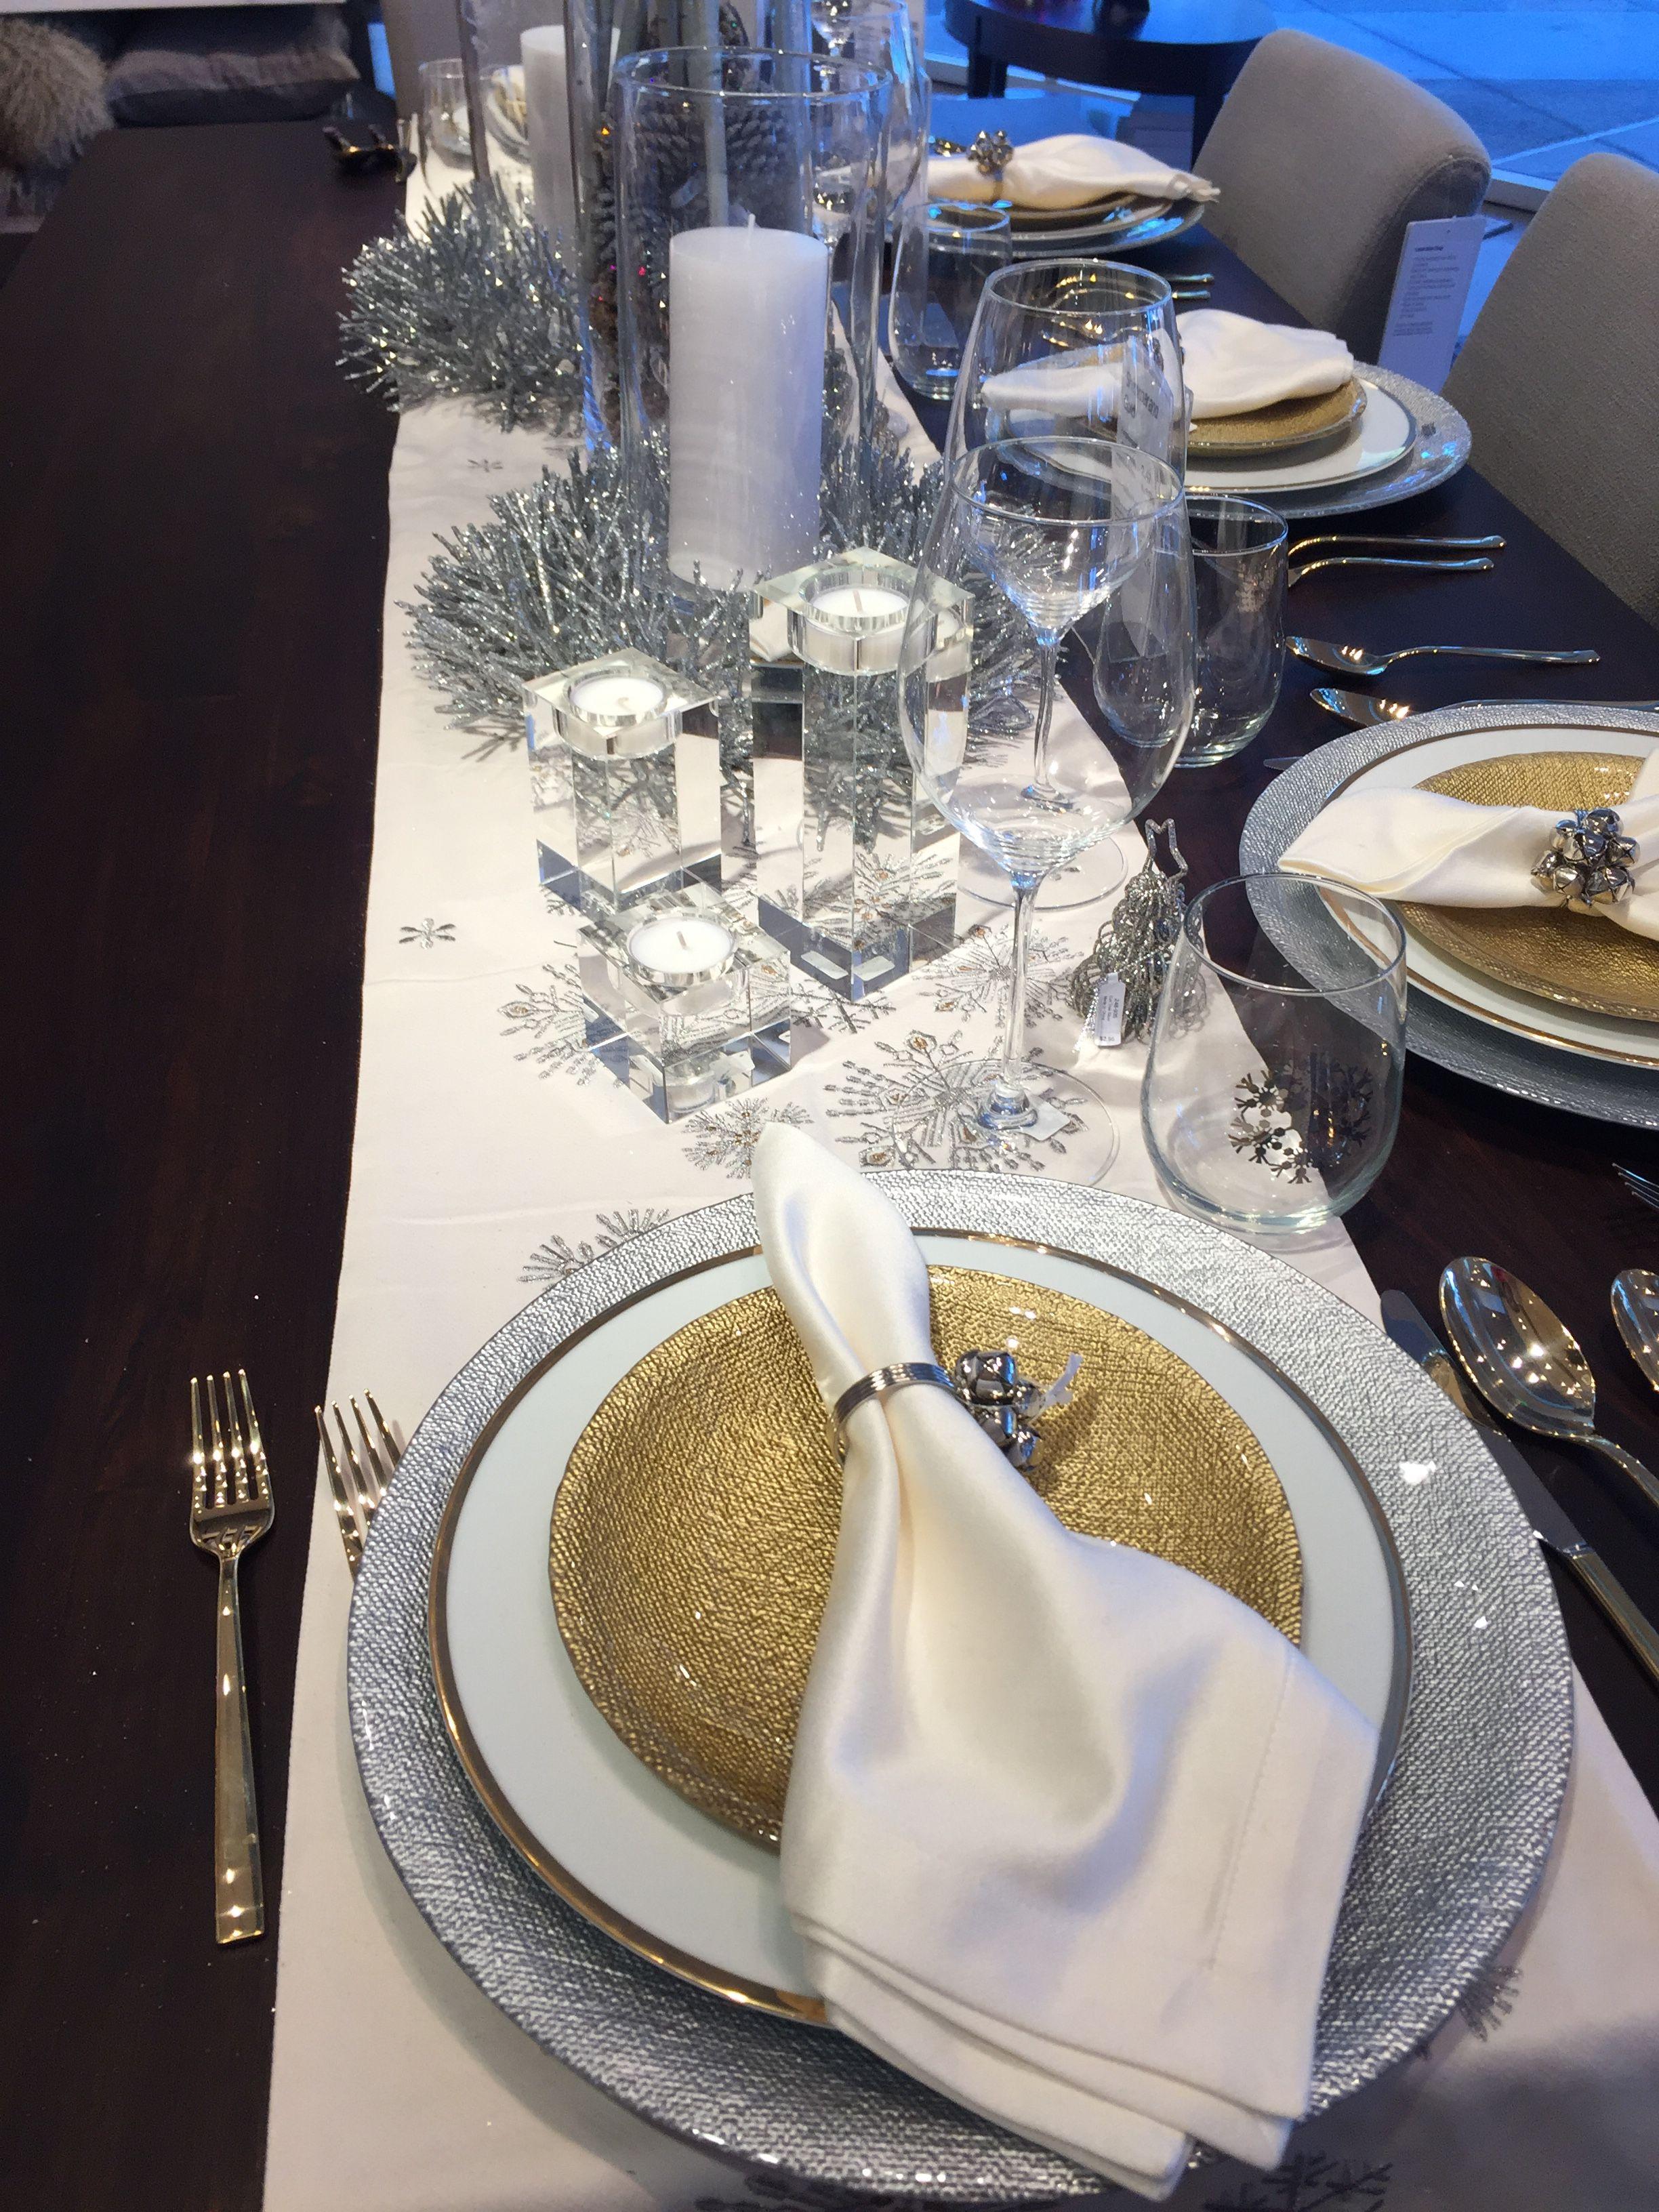 Christmas 2016 Crate And Barrel Table Setting Cream White Gold Silver Napkin Table Runner Charger Cenas De Navidad Cena Navidad